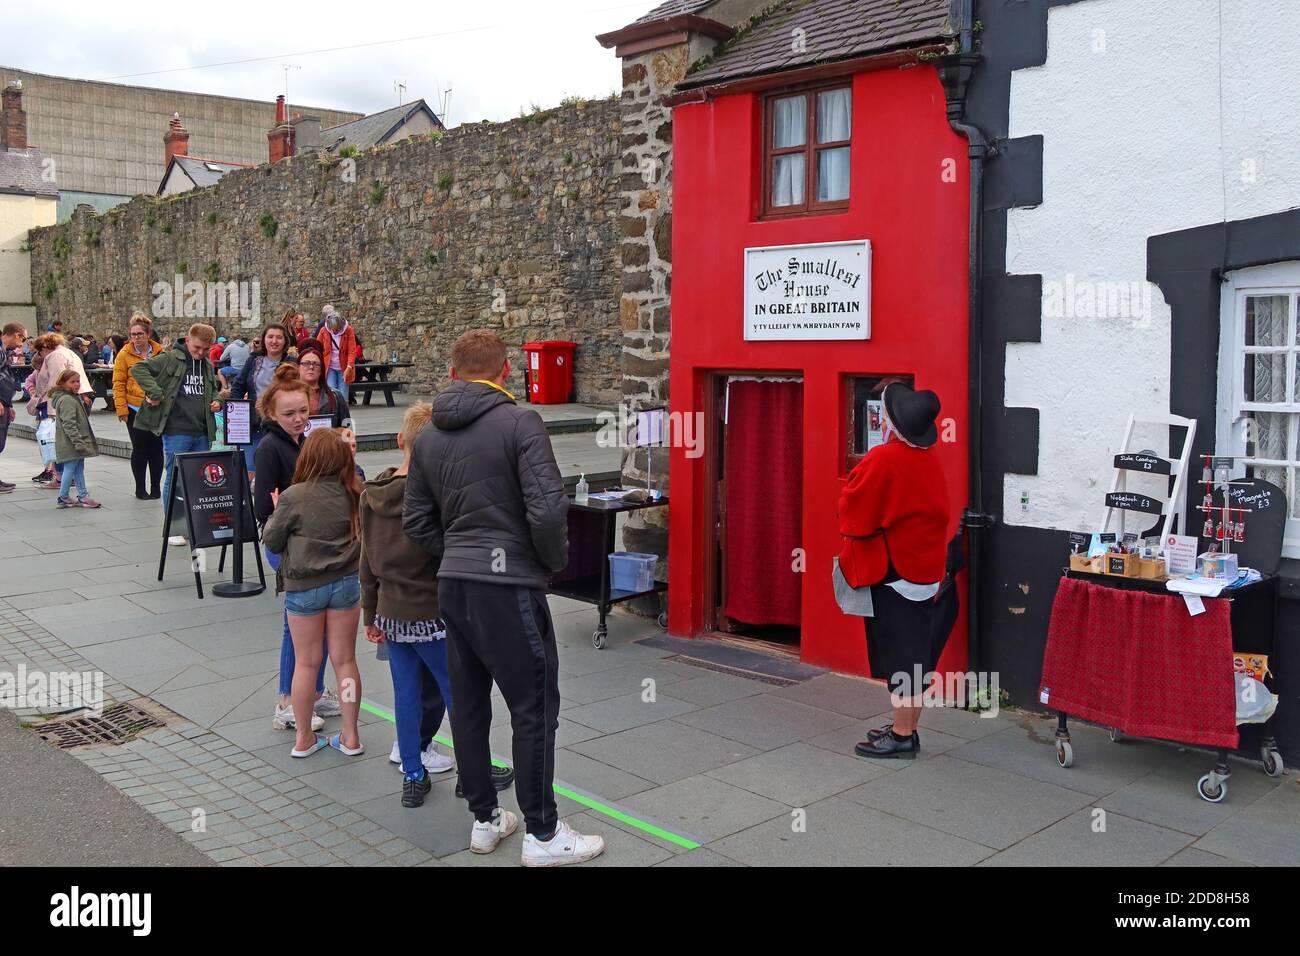 GoTonySmith,Hotpixuk,@Hotpixuk,Wales,Welsh,coast,coastal,town,United Kingdom,GB,small house,attraction,the quay,minuscule home,minuscule,home,homes,small houses,smallest house in the United Kingdom,Robert Jones,tour,tours,Y Tŷ Lleiaf ym Mhrydain Fawr,10 Lower Gate St,Conwy LL32 8BE,LL32,Lower Gate Street,LL32 8BE,Gwynedd,Conway,River Conwy Quay